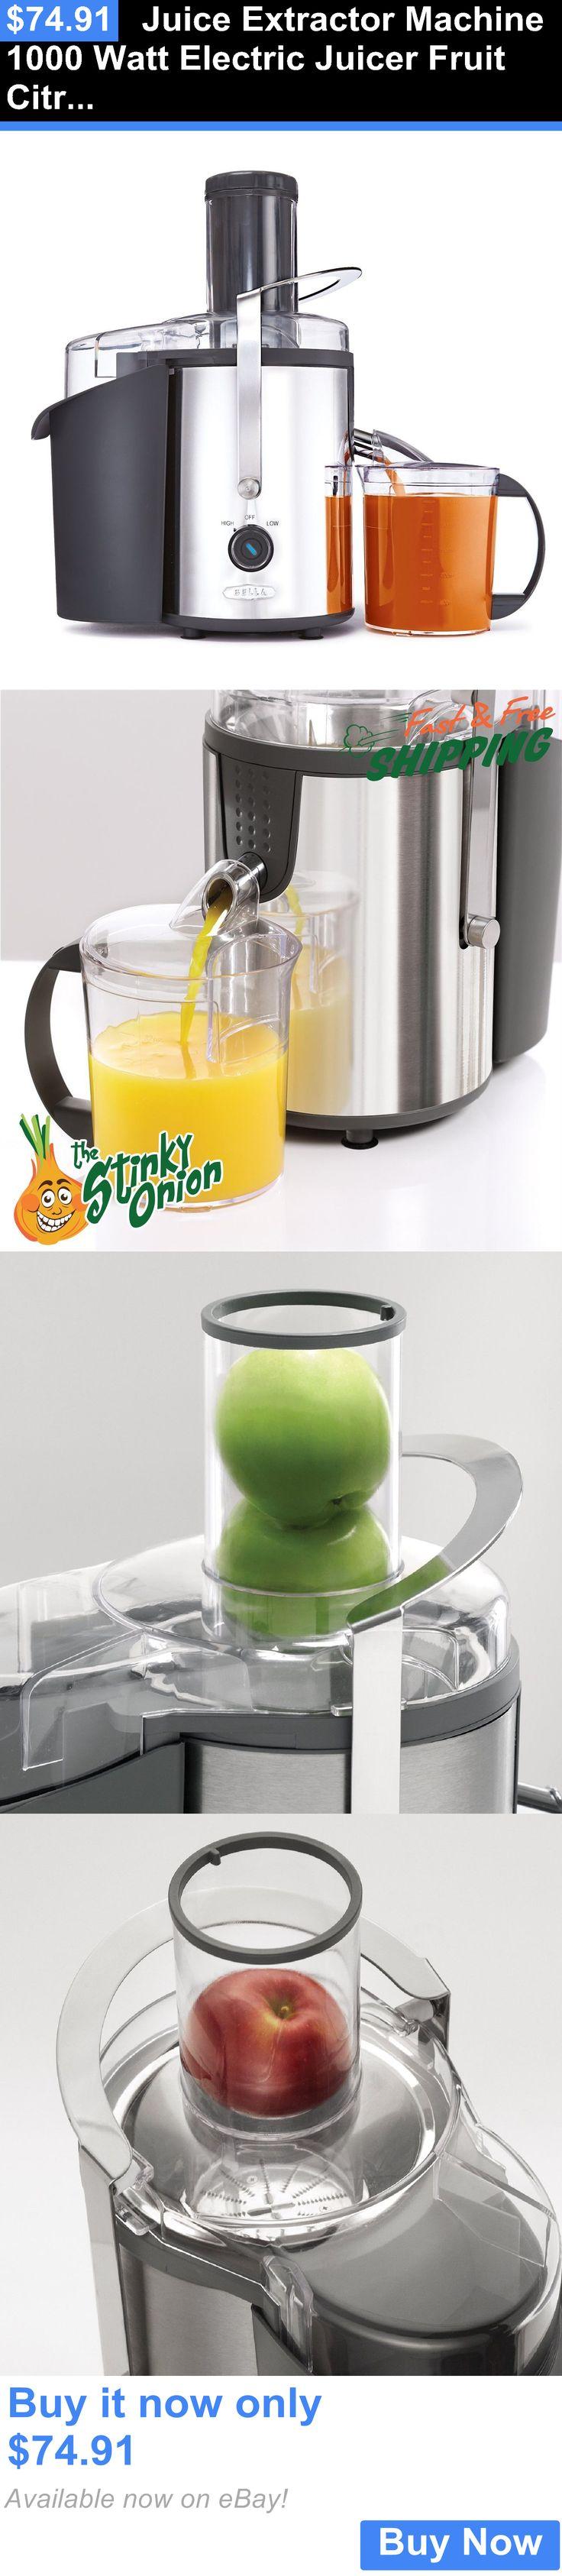 Small Kitchen Appliances: Juice Extractor Machine 1000 Watt Electric Juicer Fruit Citrus Squeezer BUY IT NOW ONLY: $74.91